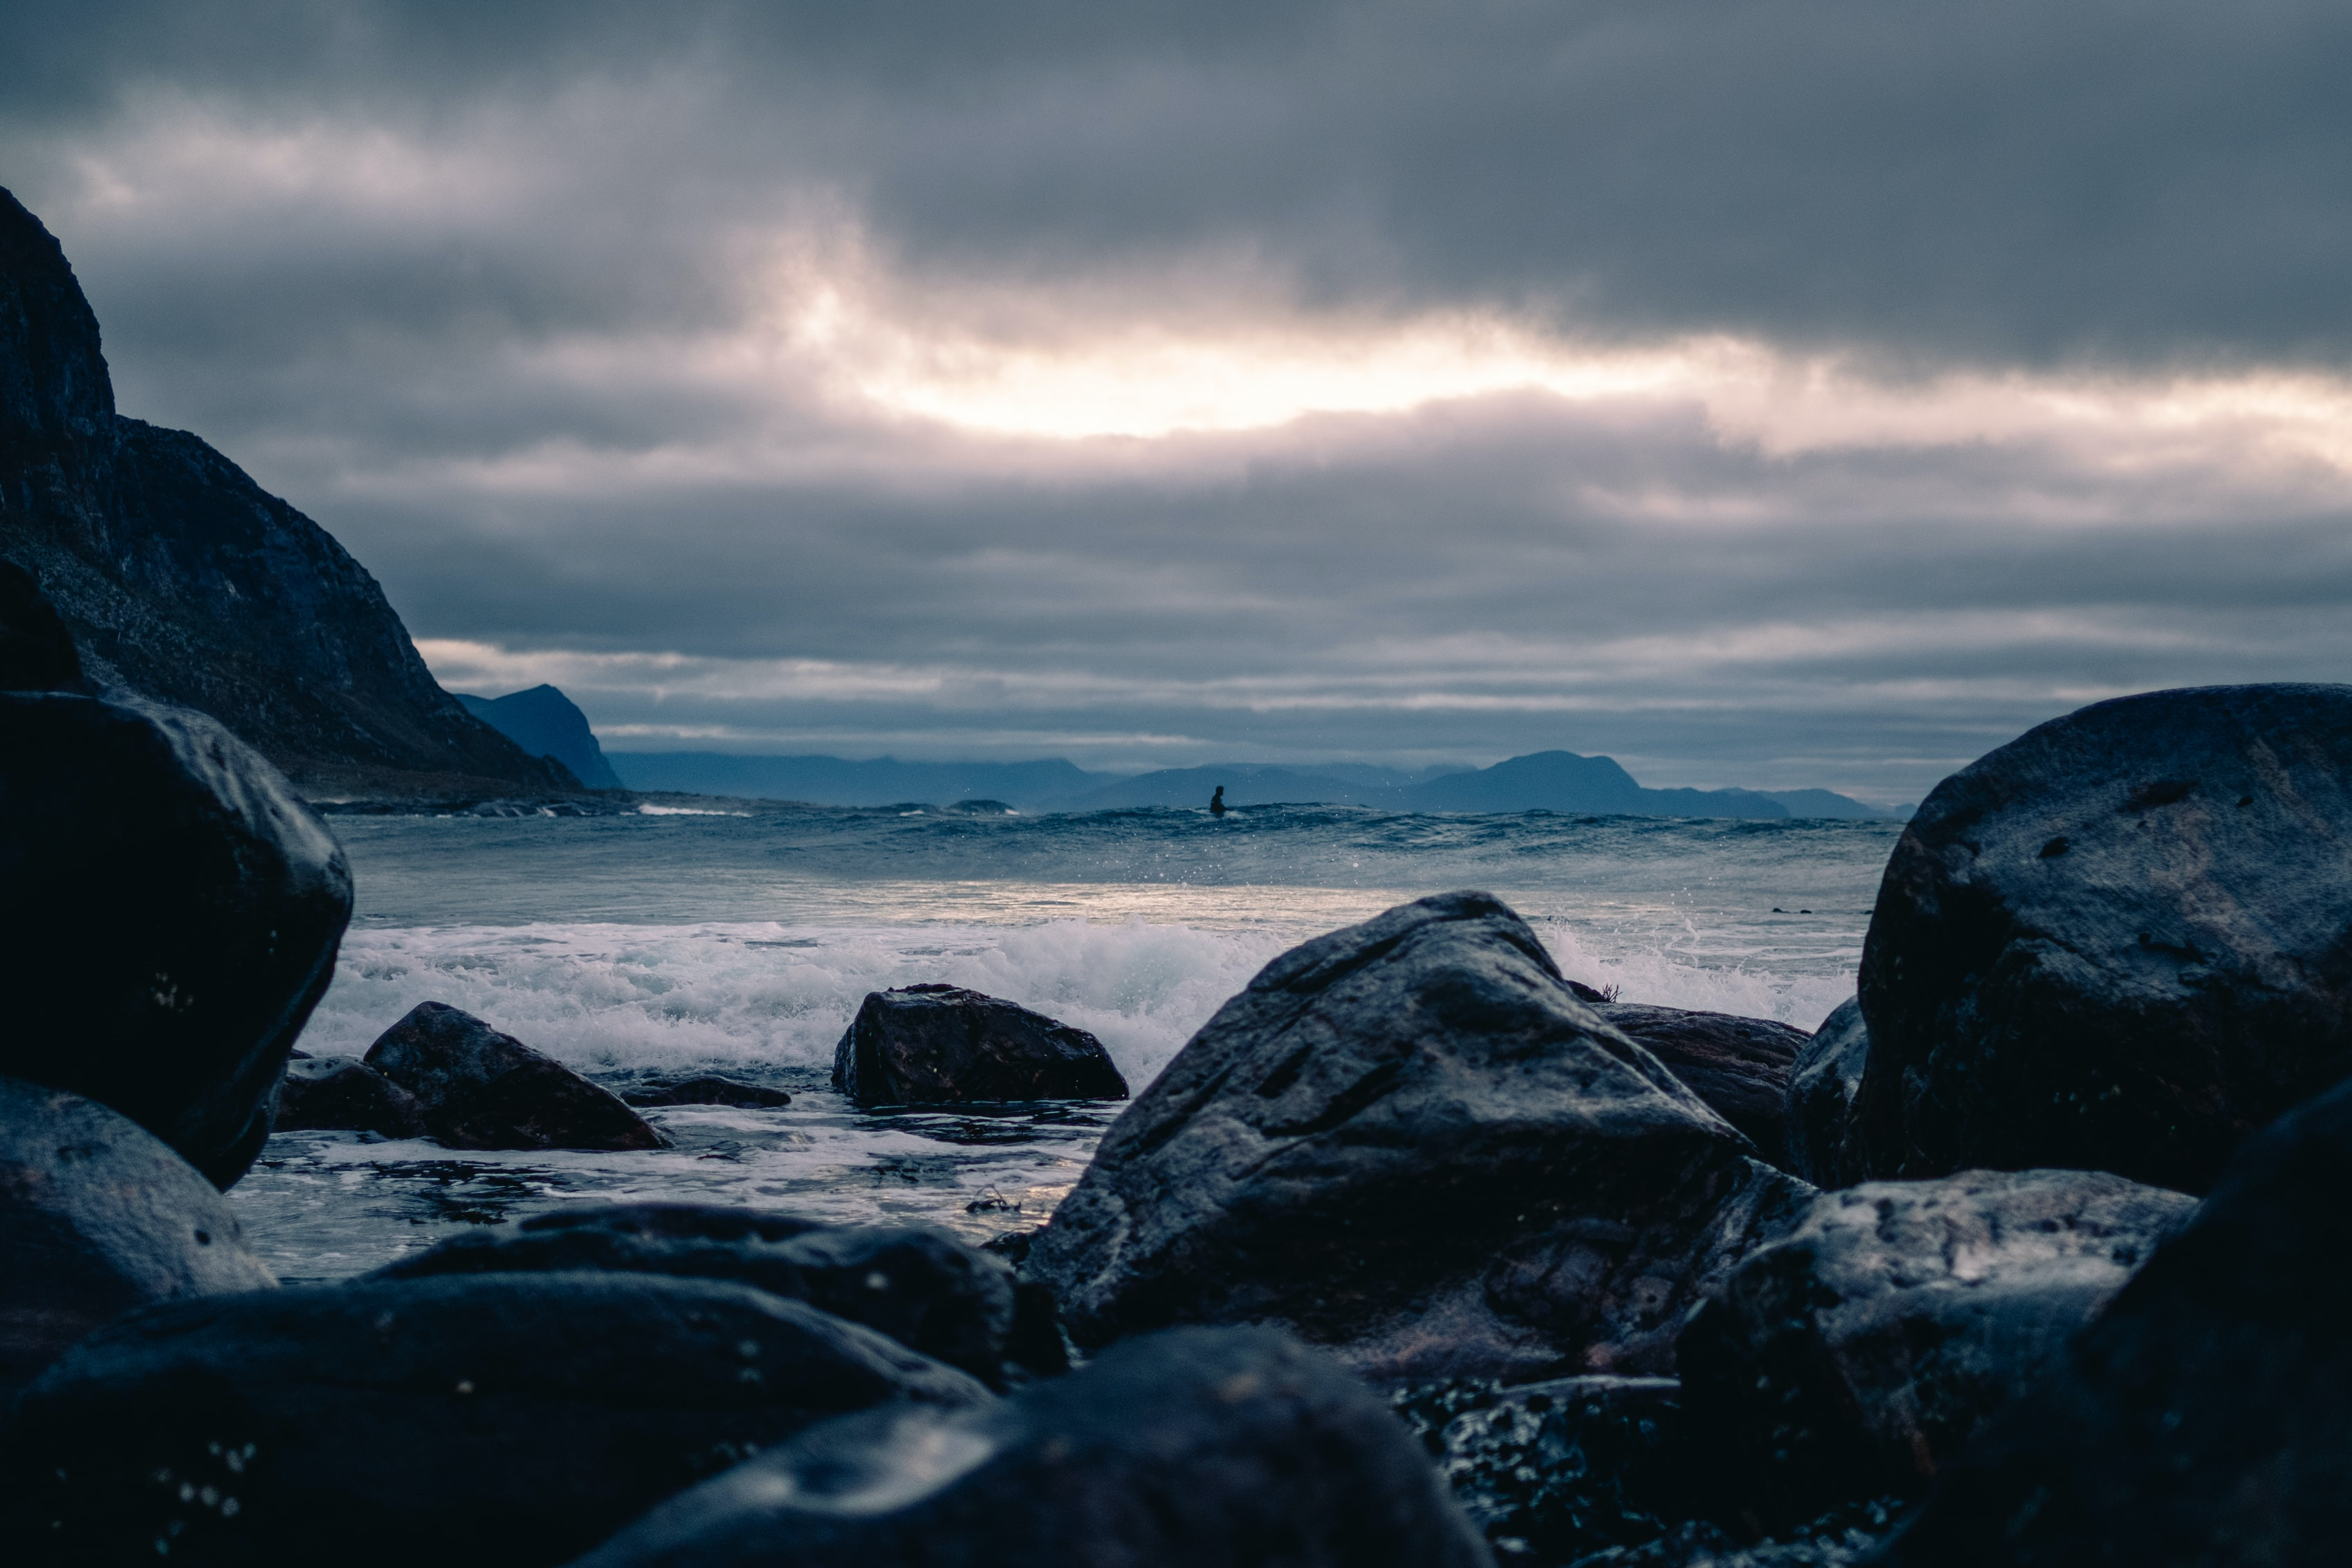 sea waves crashing towards rocks